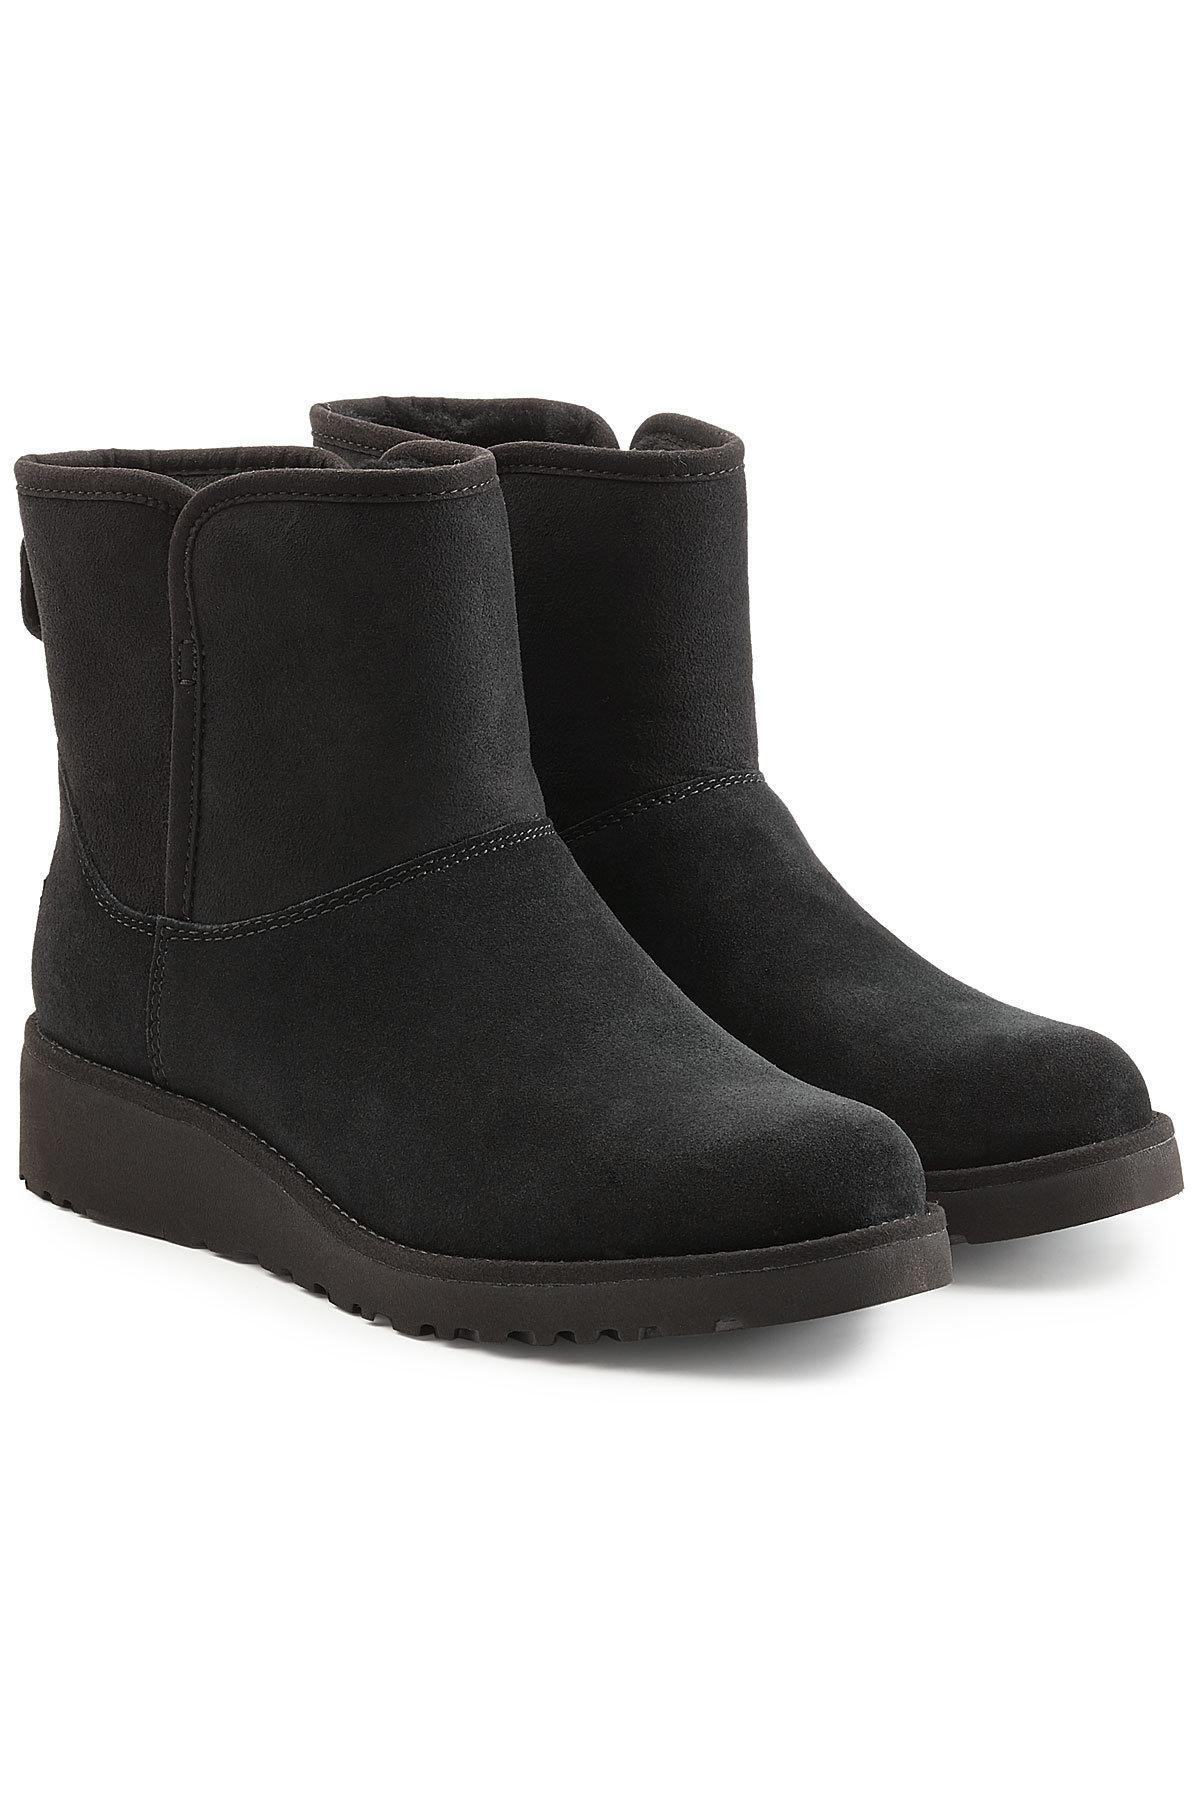 Ugg Kristin Classic Slim Suede Boots In Black